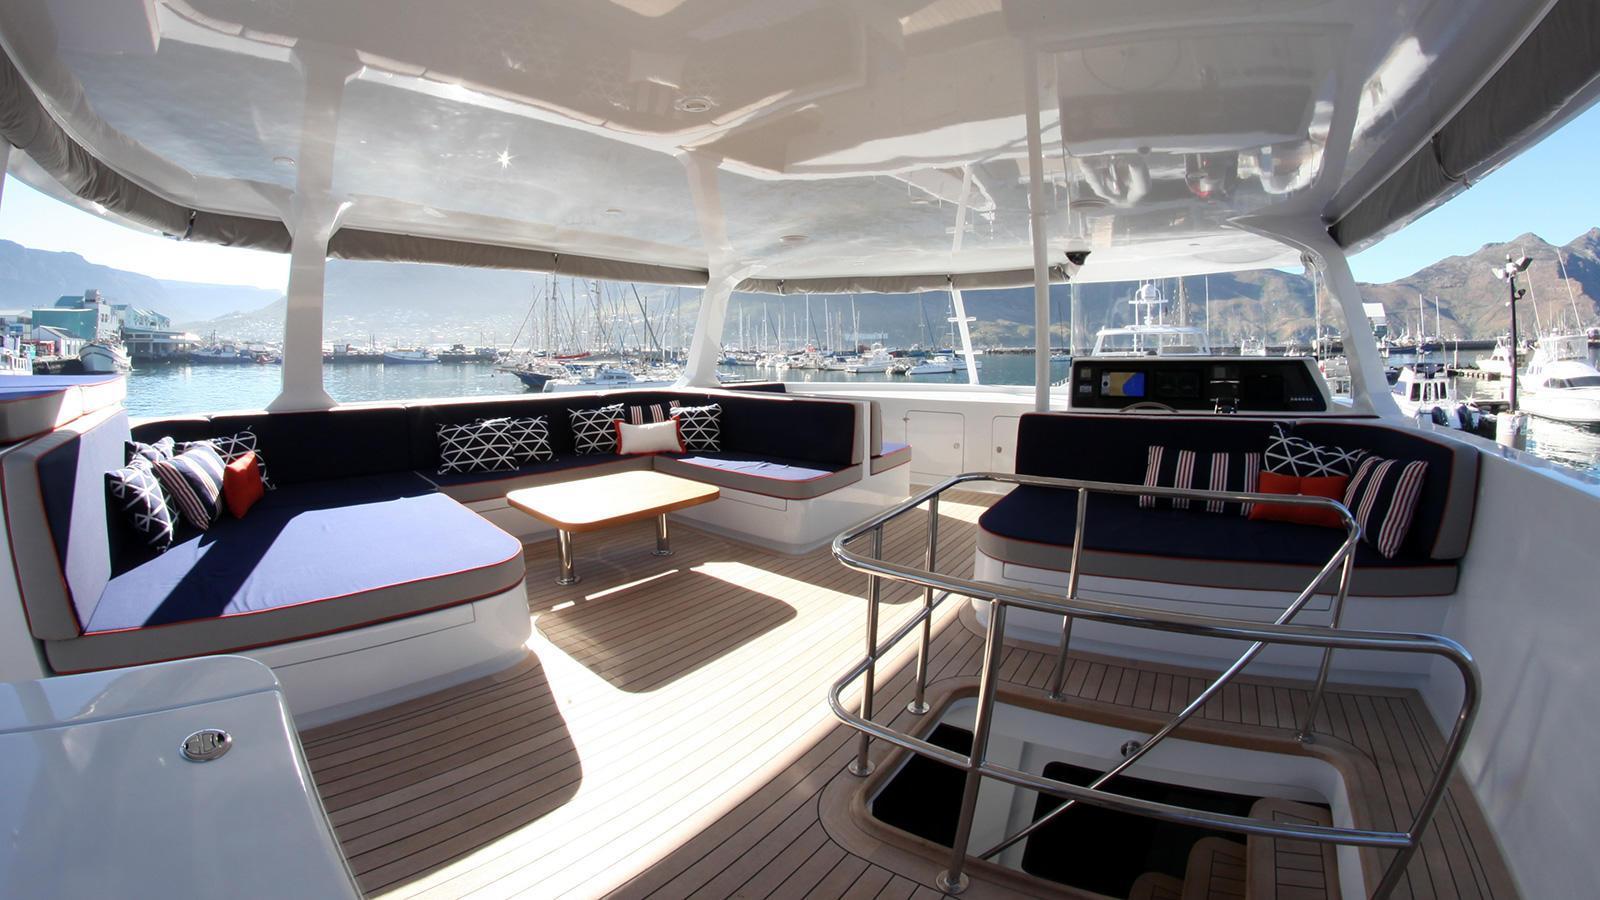 ultra vires catamaran motoryacht two oceans marine 2016 25m sundeck